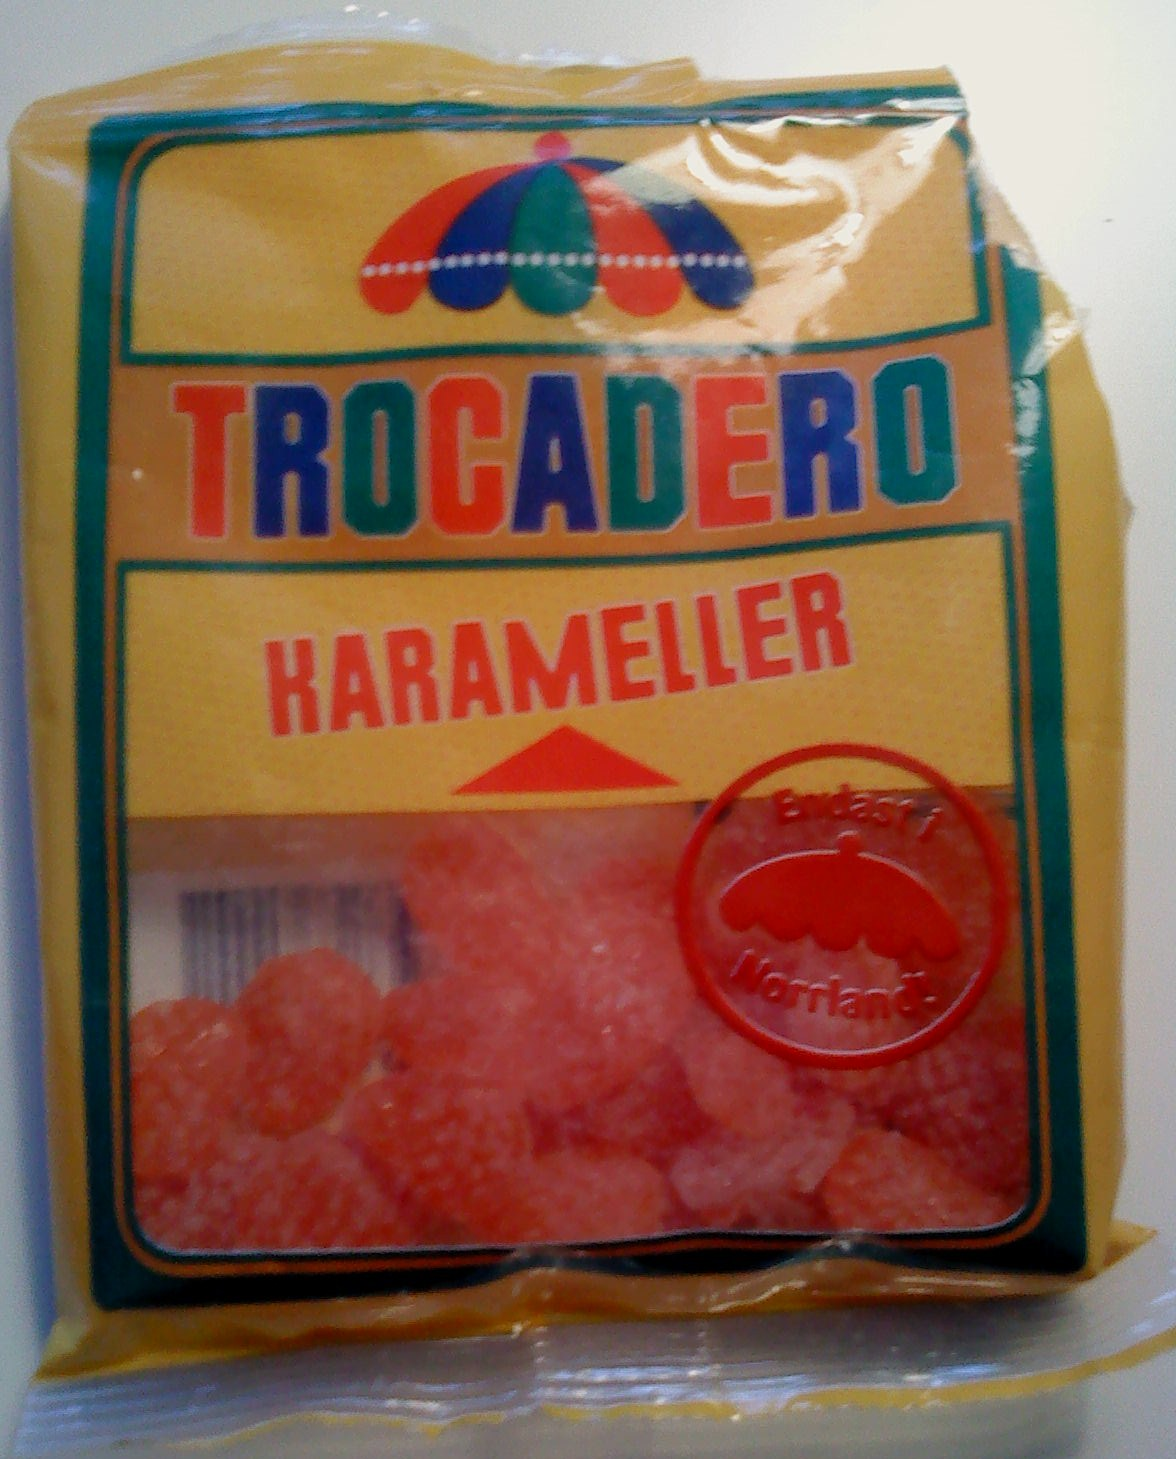 http://upload.wikimedia.org/wikipedia/commons/a/a3/Trocadero_karameller.JPG